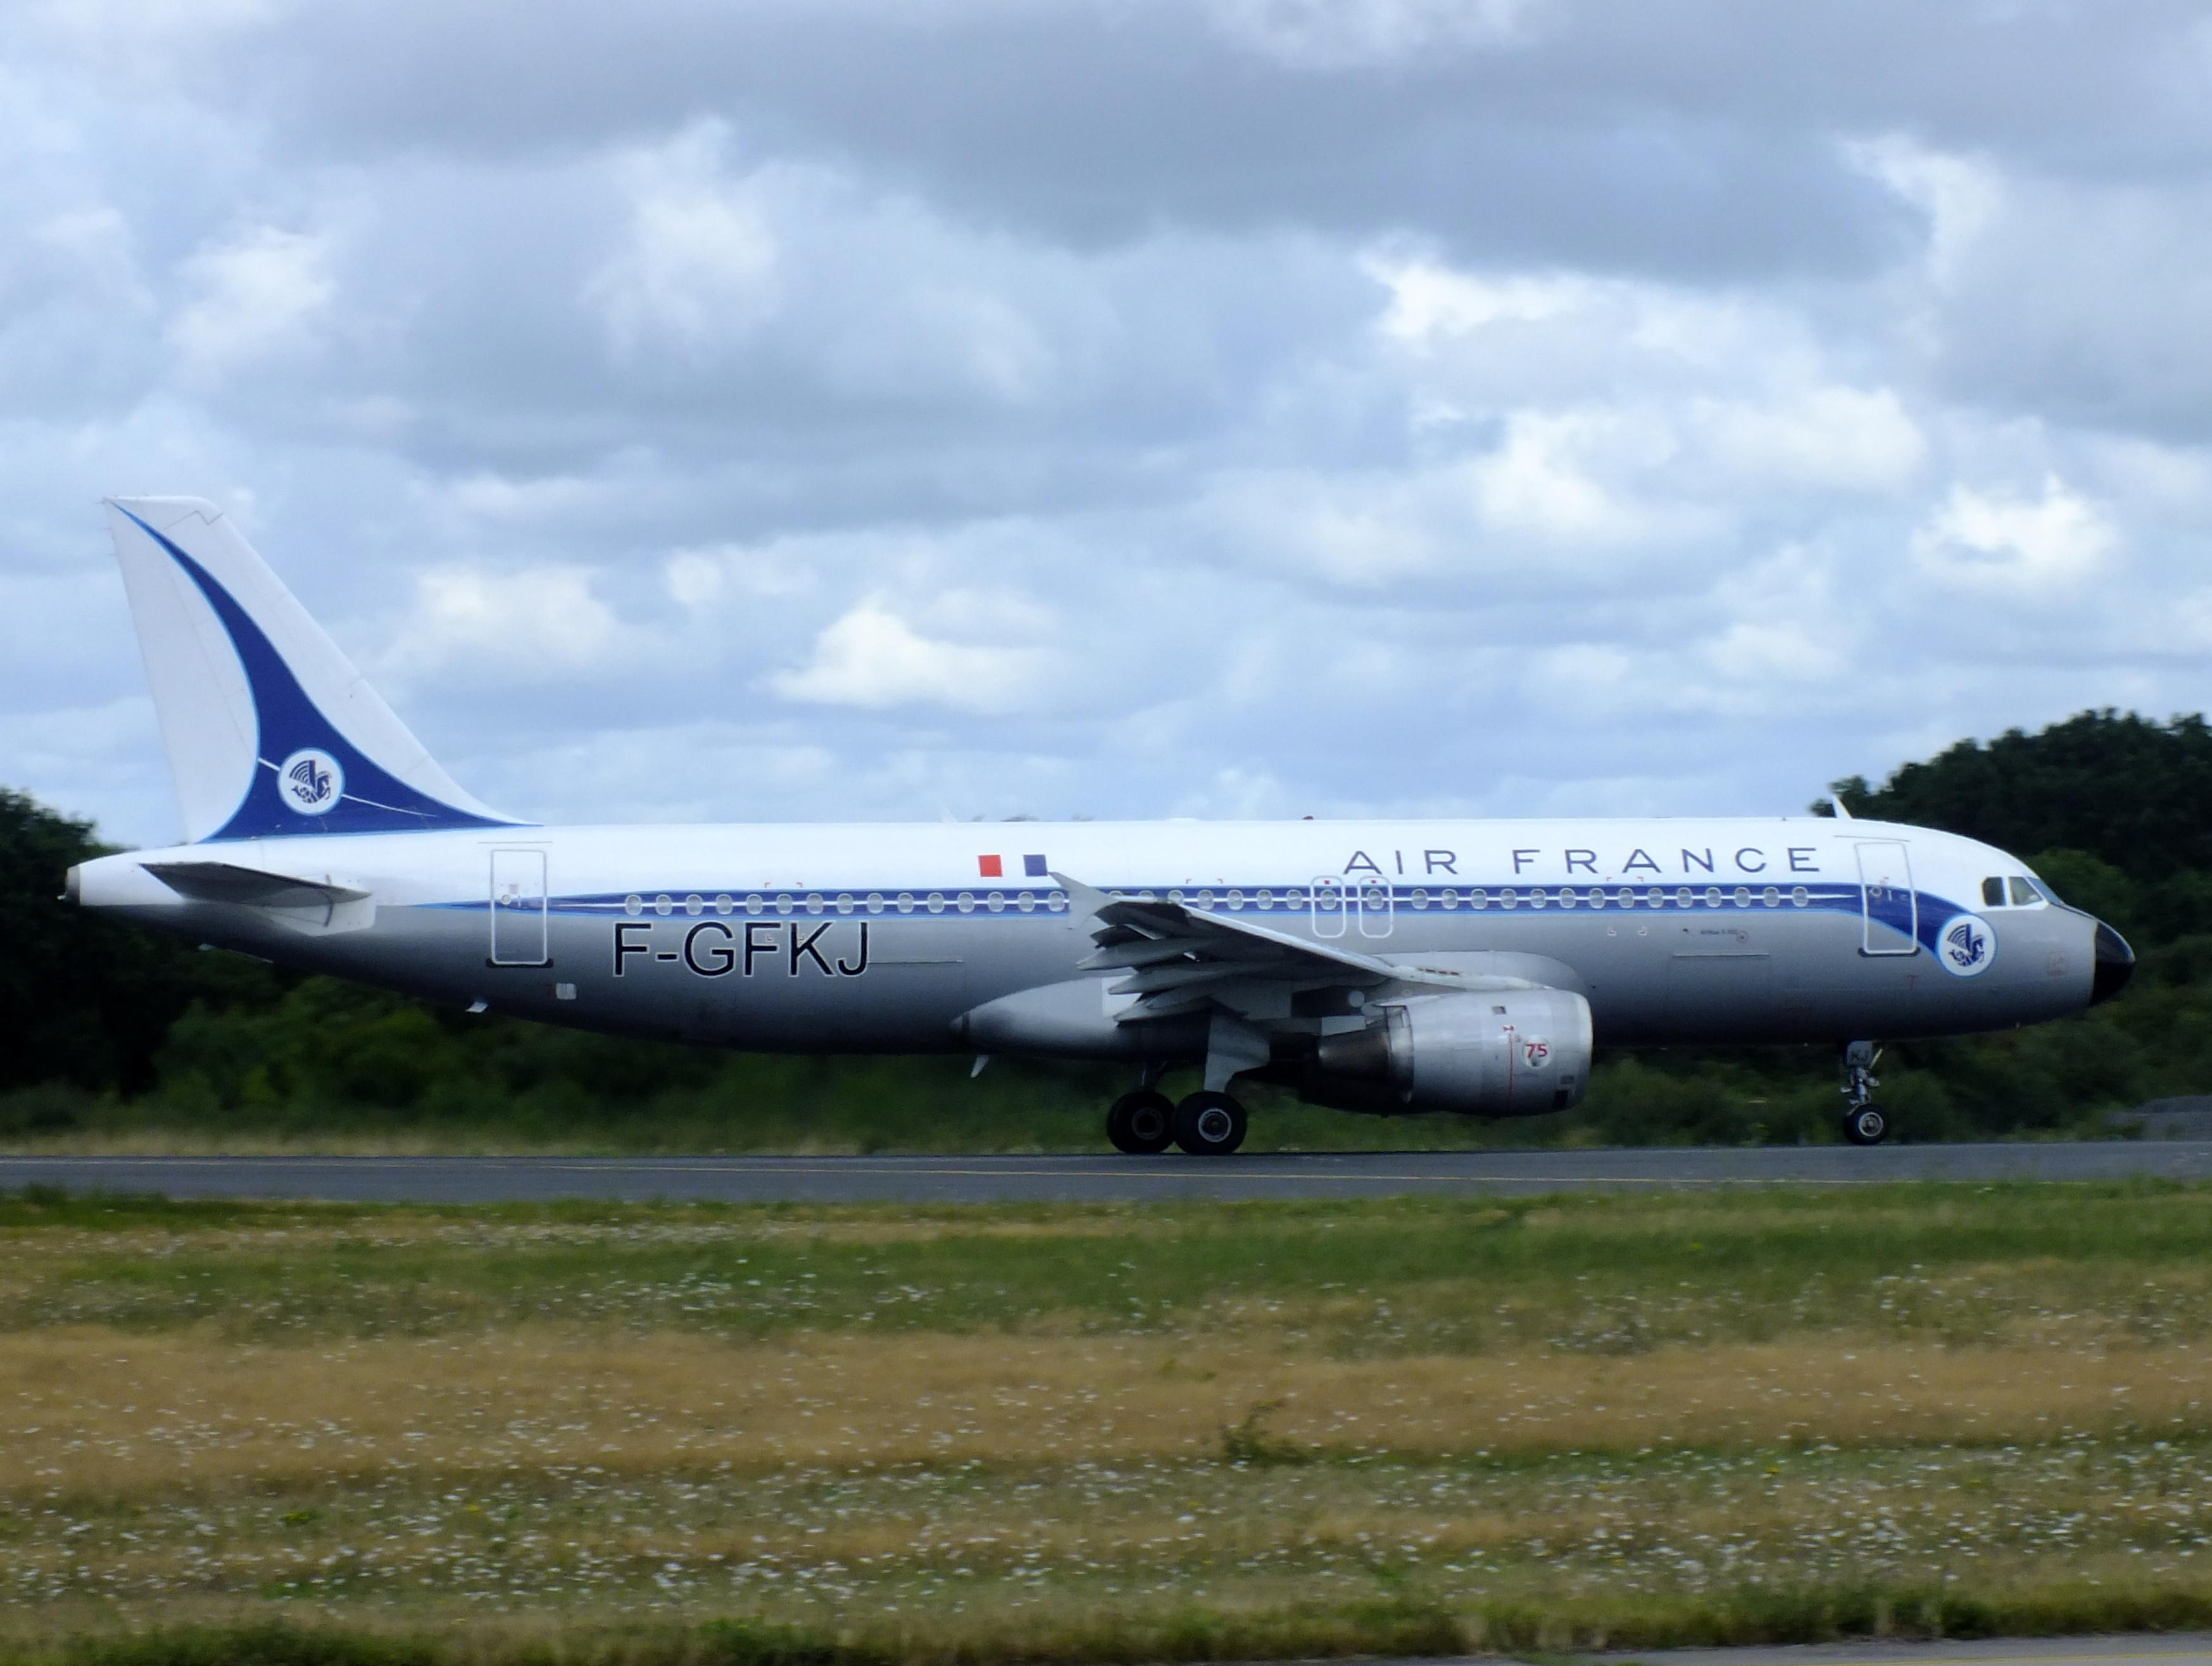 [F-GFKJ] A320 RetroJet Air France - Page 4 726851Aoutn3083